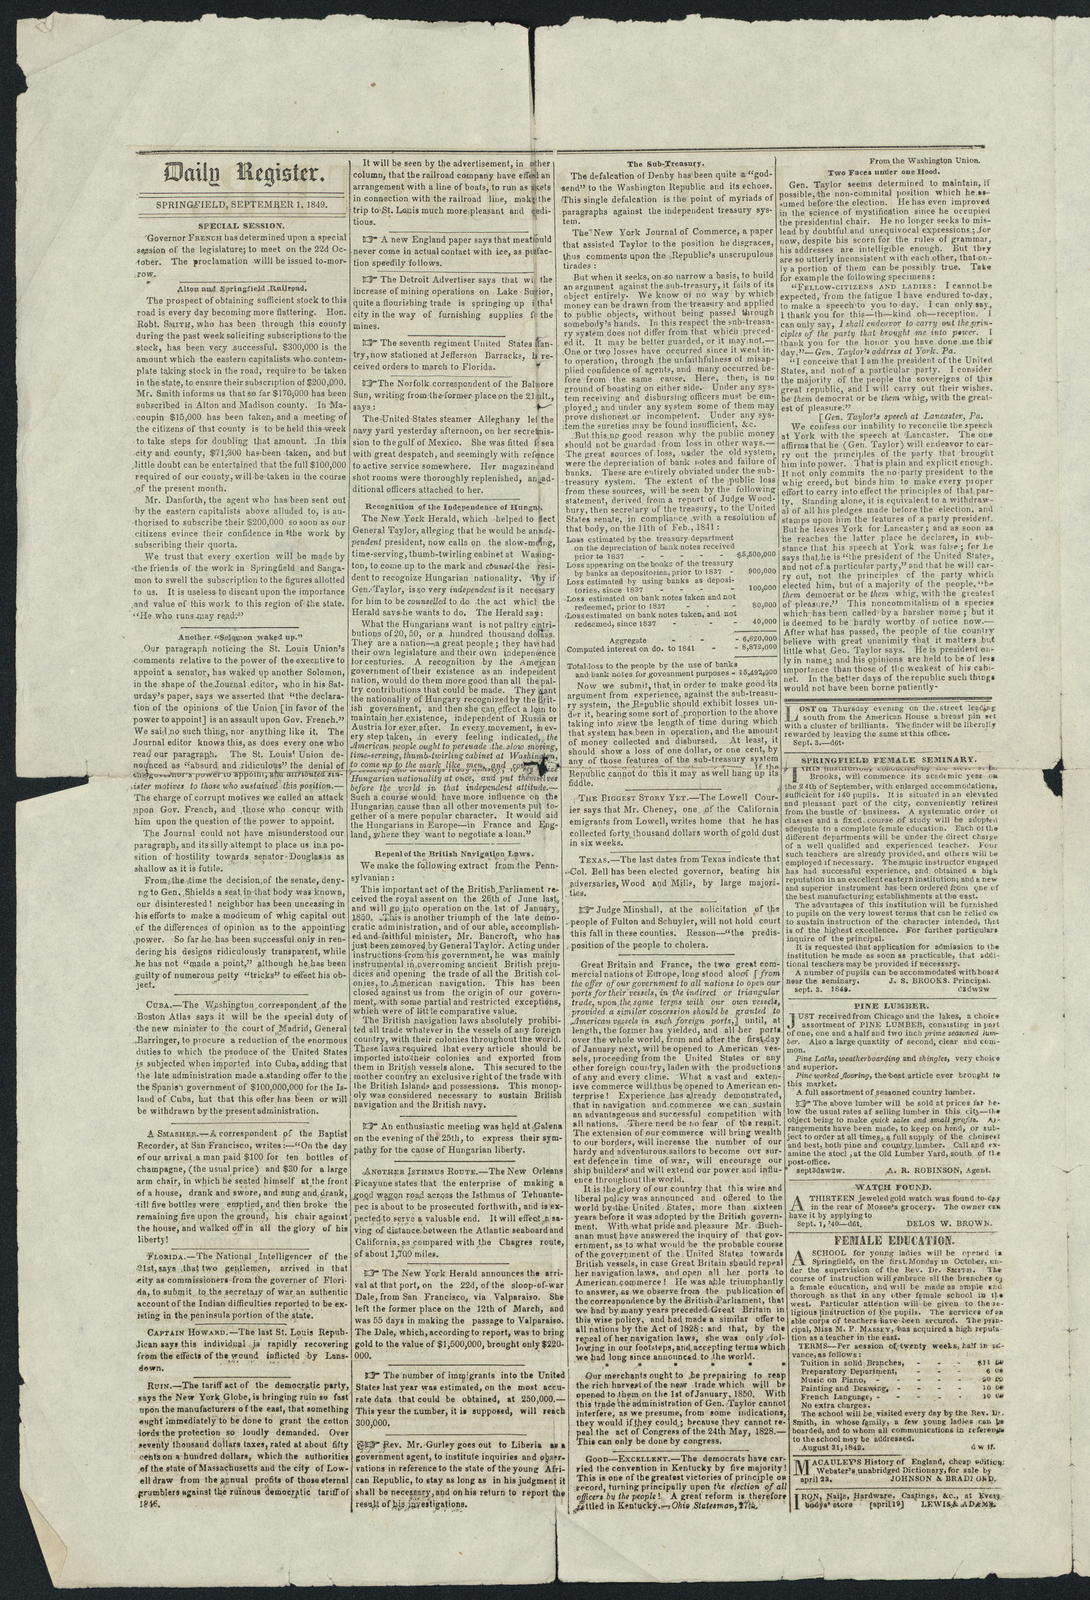 Daily Register, Vol. I, Springfield, [newspaper]. September 3, 1849.